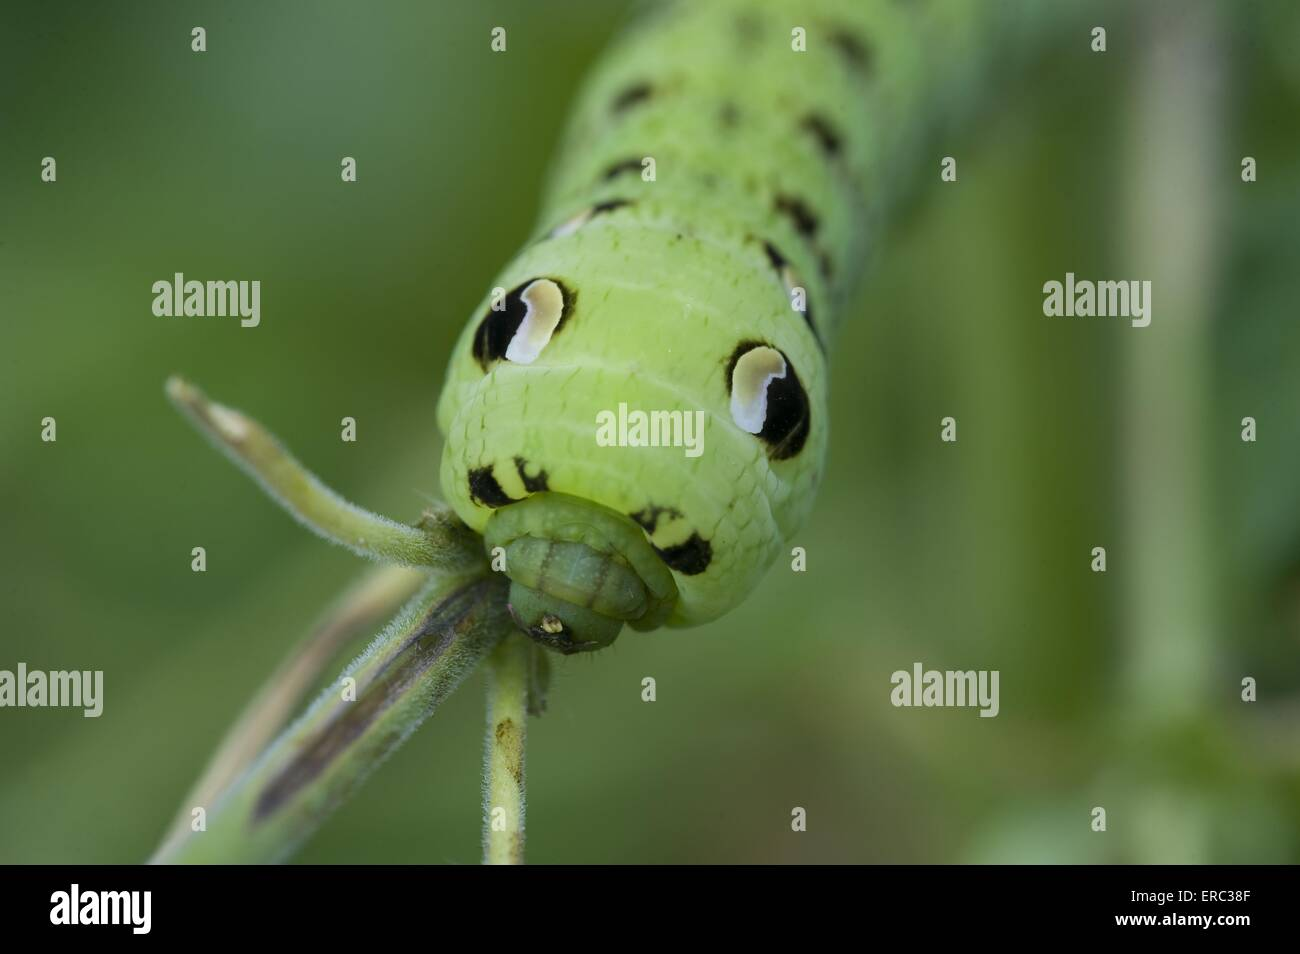 hawk-moth grub - Stock Image